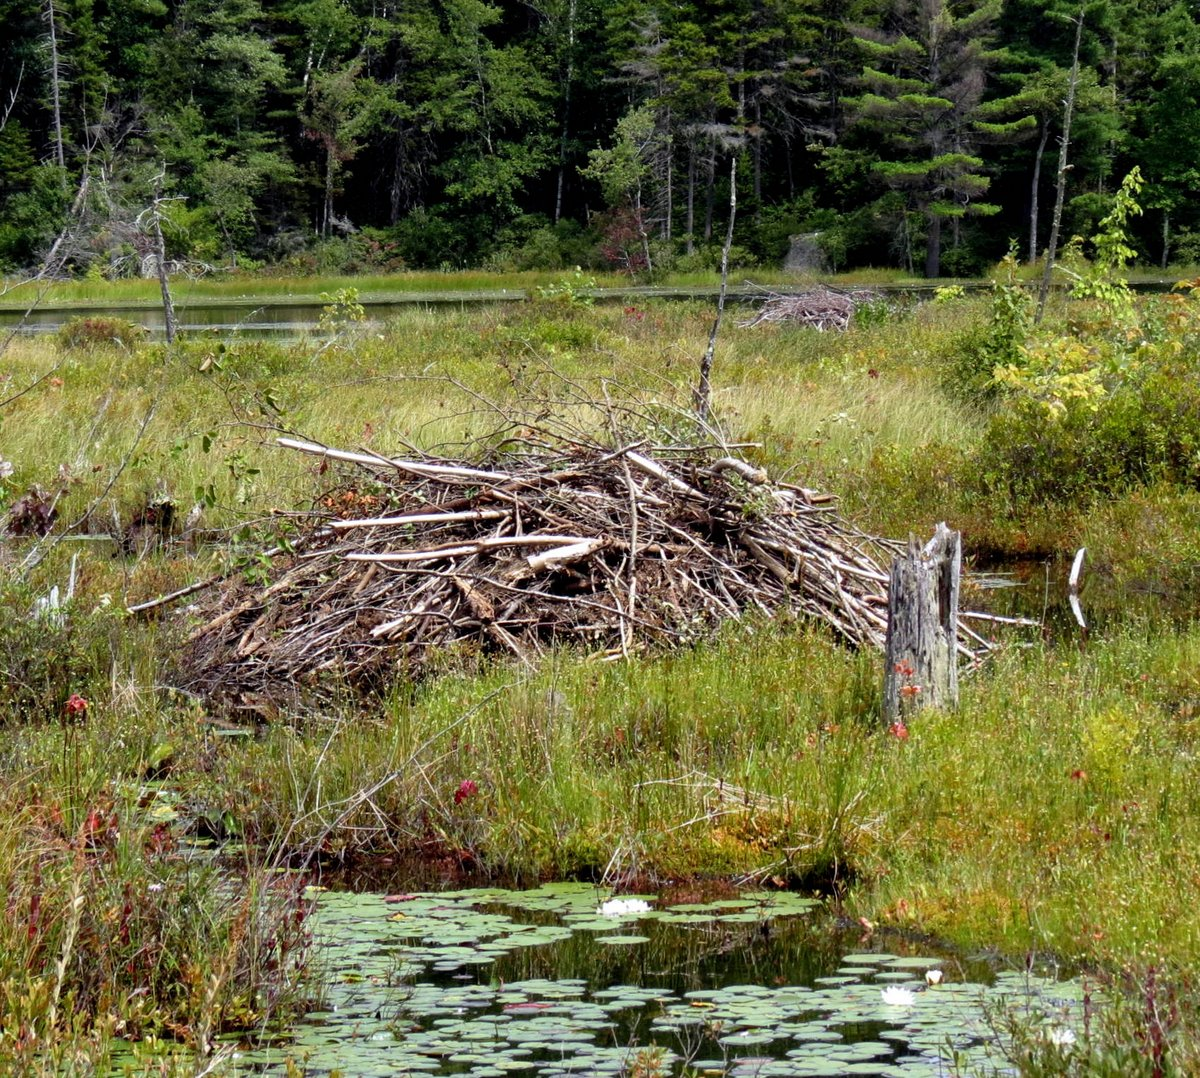 5. Beaver Lodges